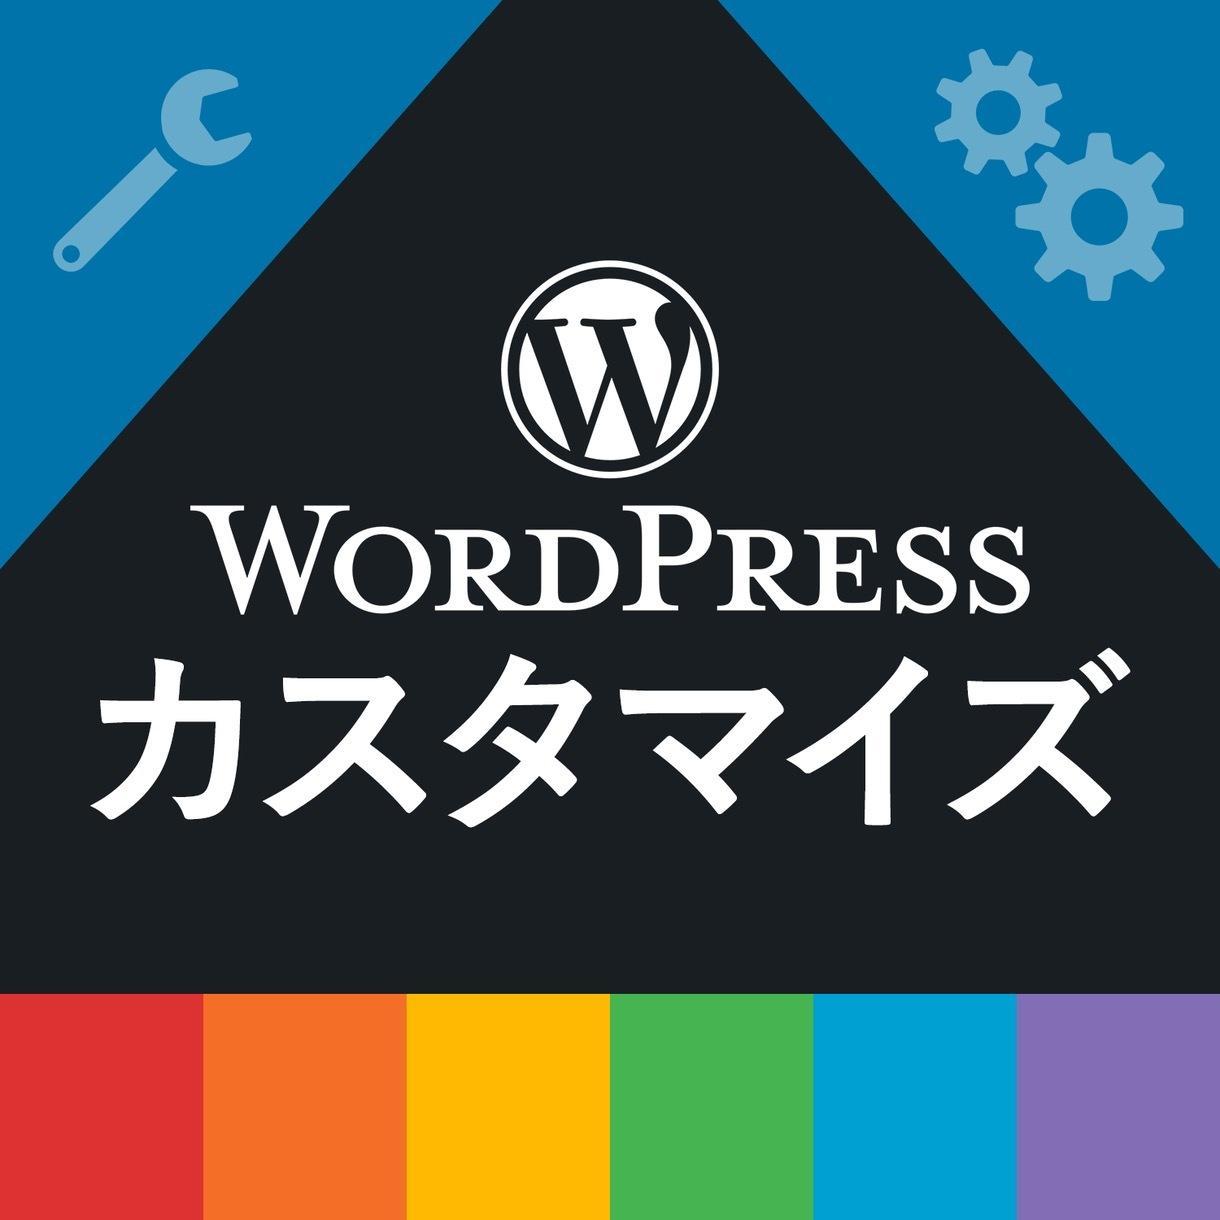 WordPressの「困った」、代わって解決します WordPressのカスタマイズや修正ならお任せ下さい